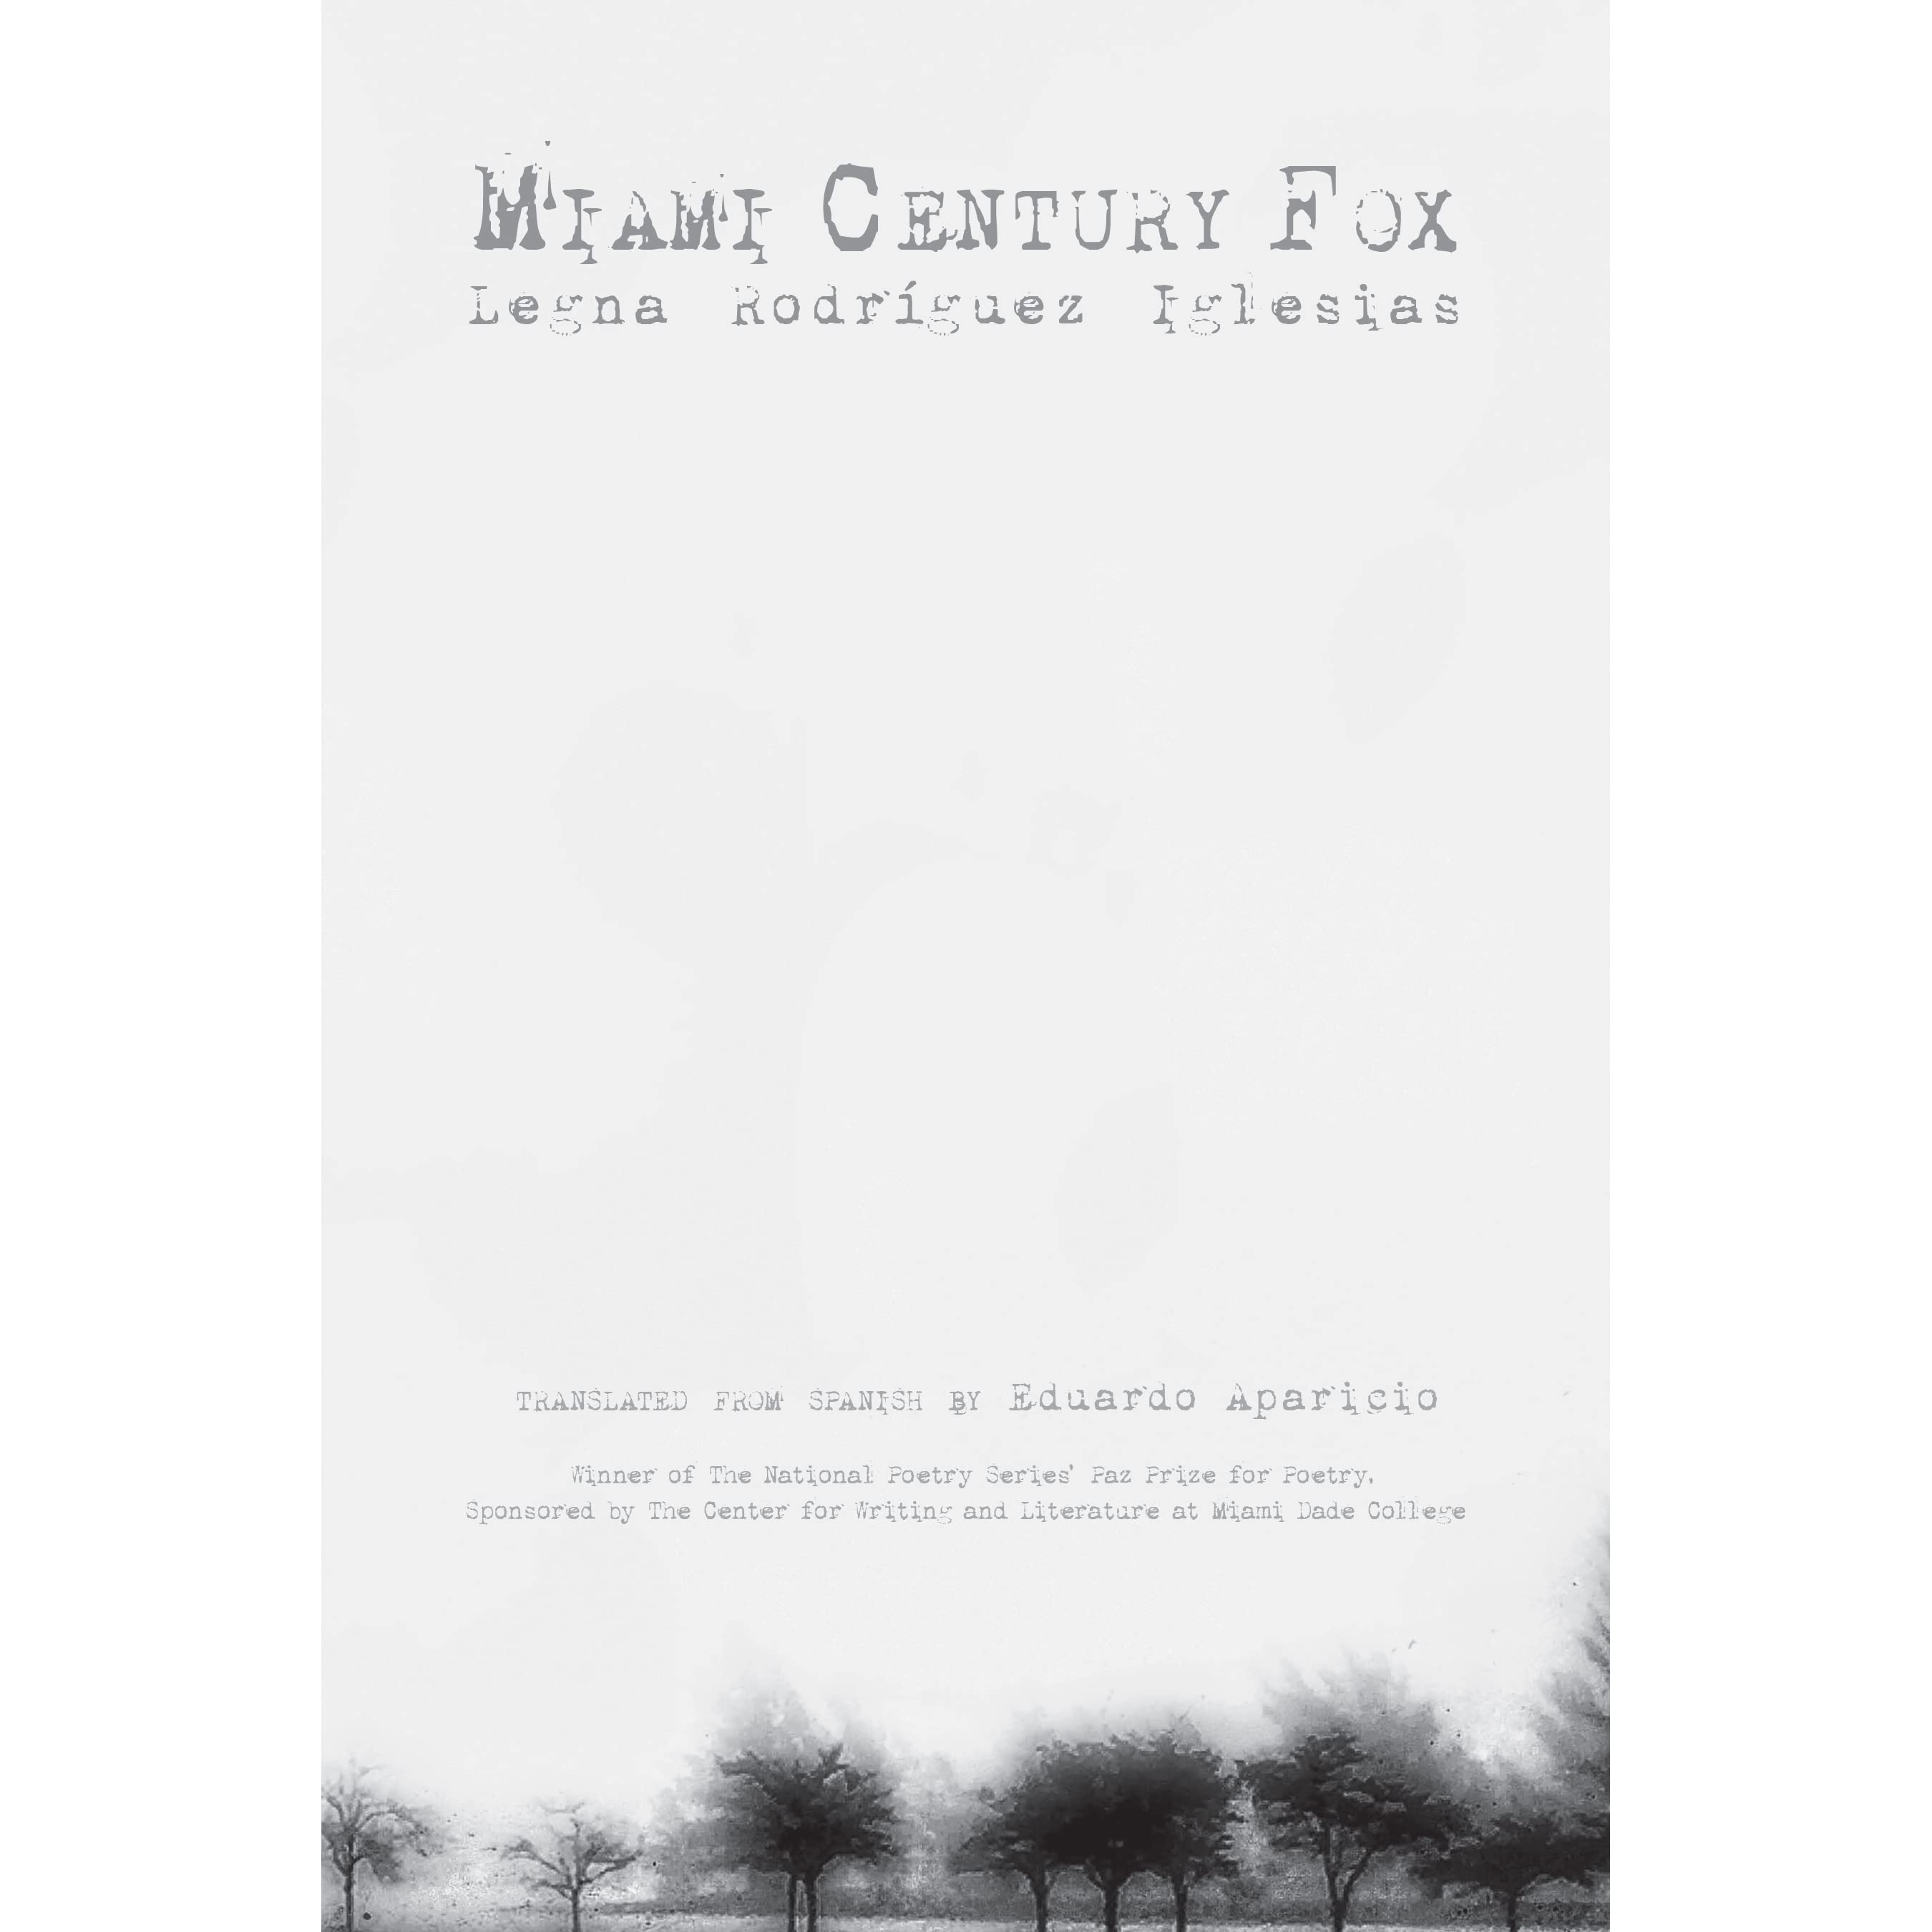 Miami Century Fox by Legna Rodríguez Iglesias